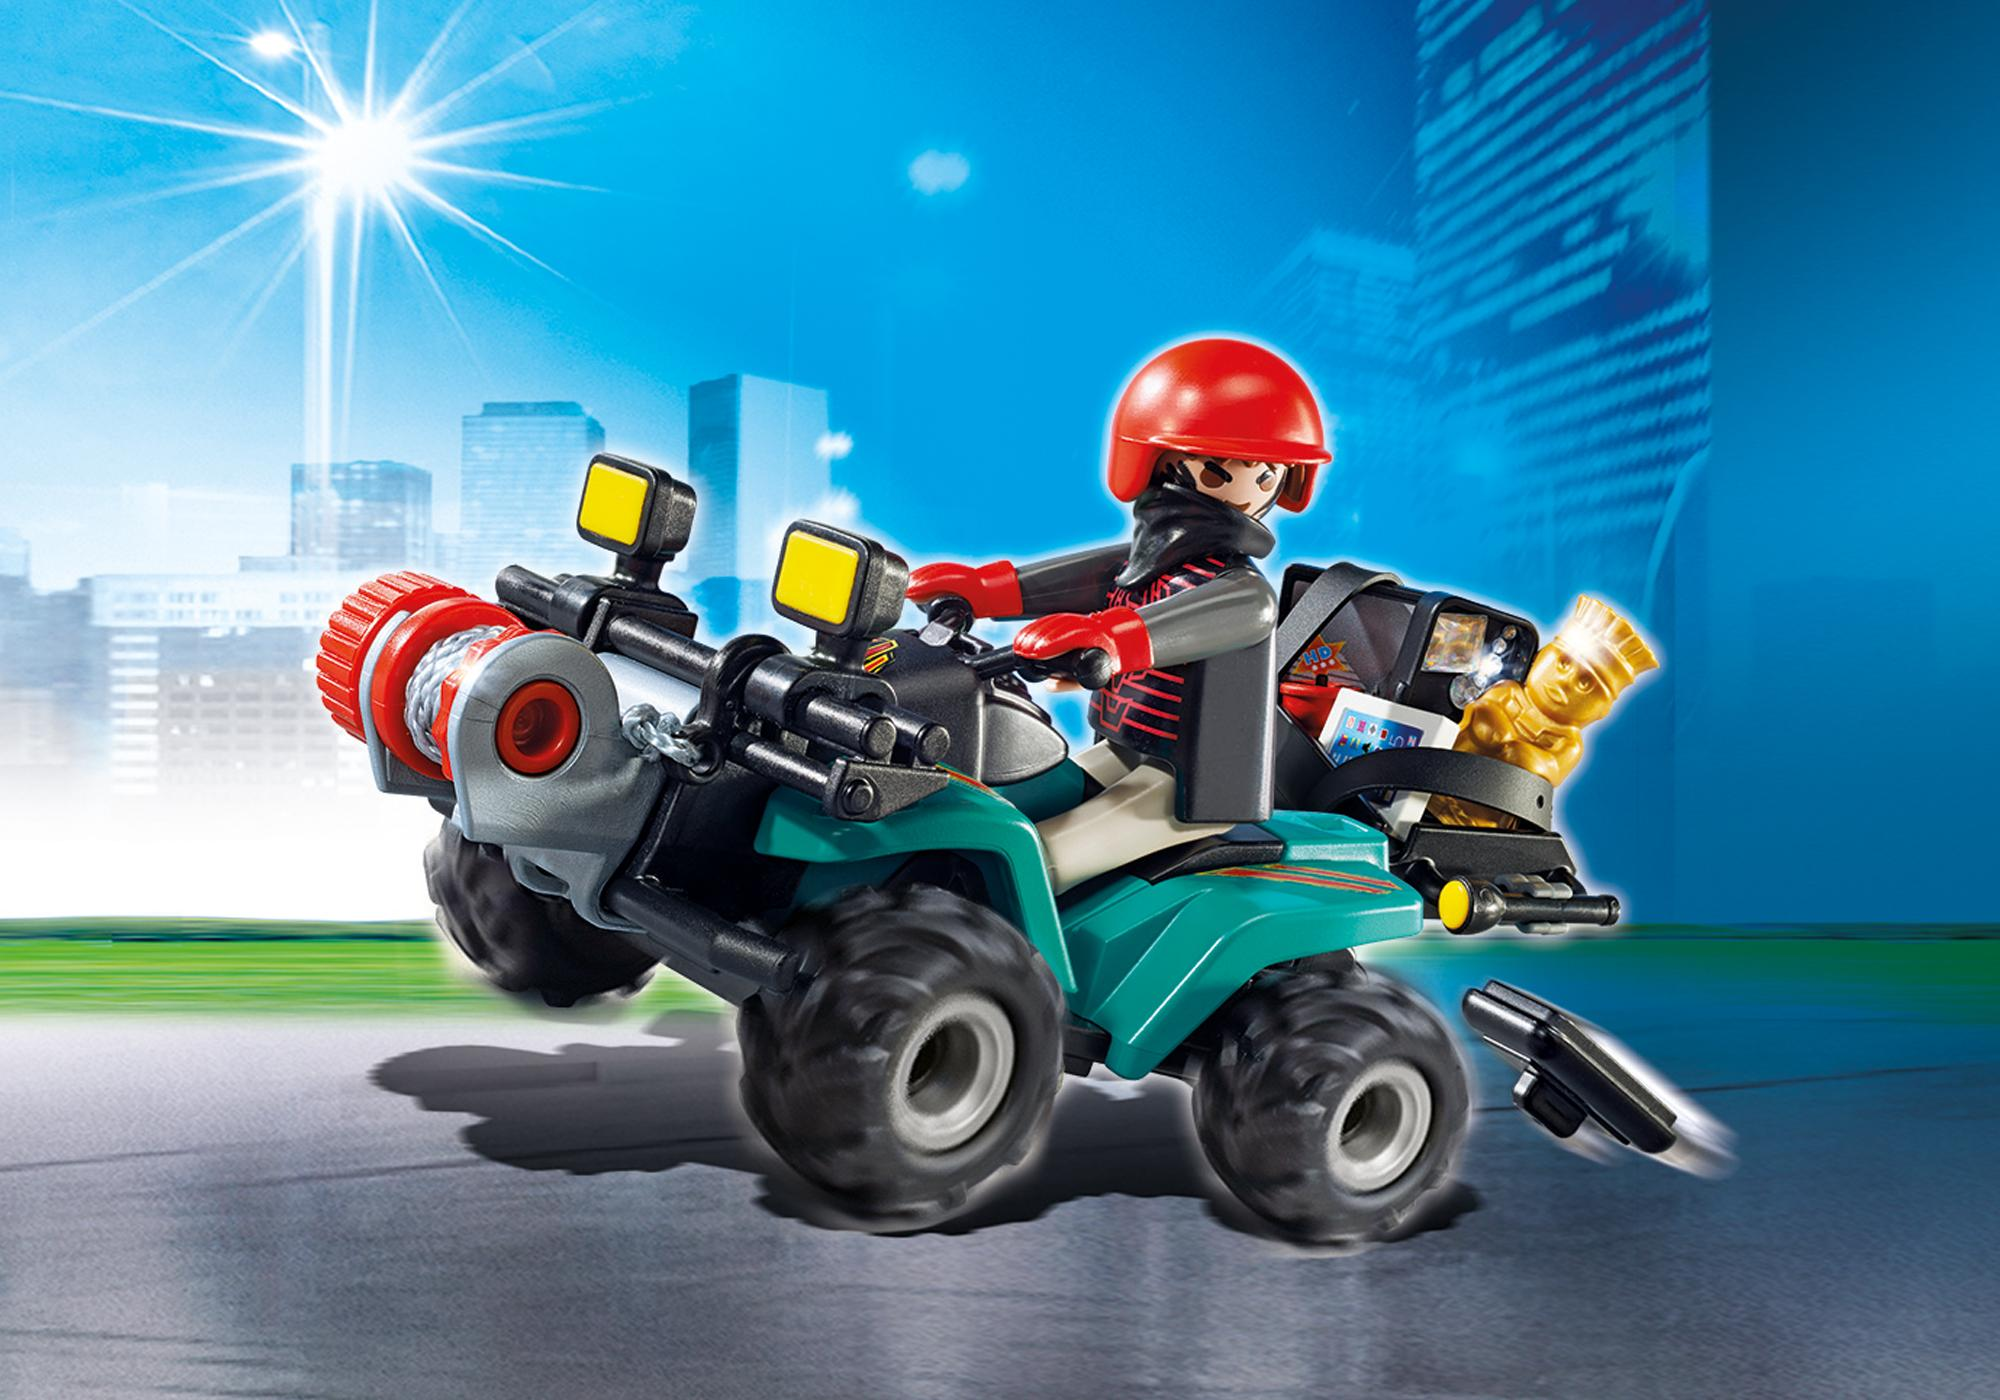 http://media.playmobil.com/i/playmobil/6879_product_detail/Bandiet en quad met lier